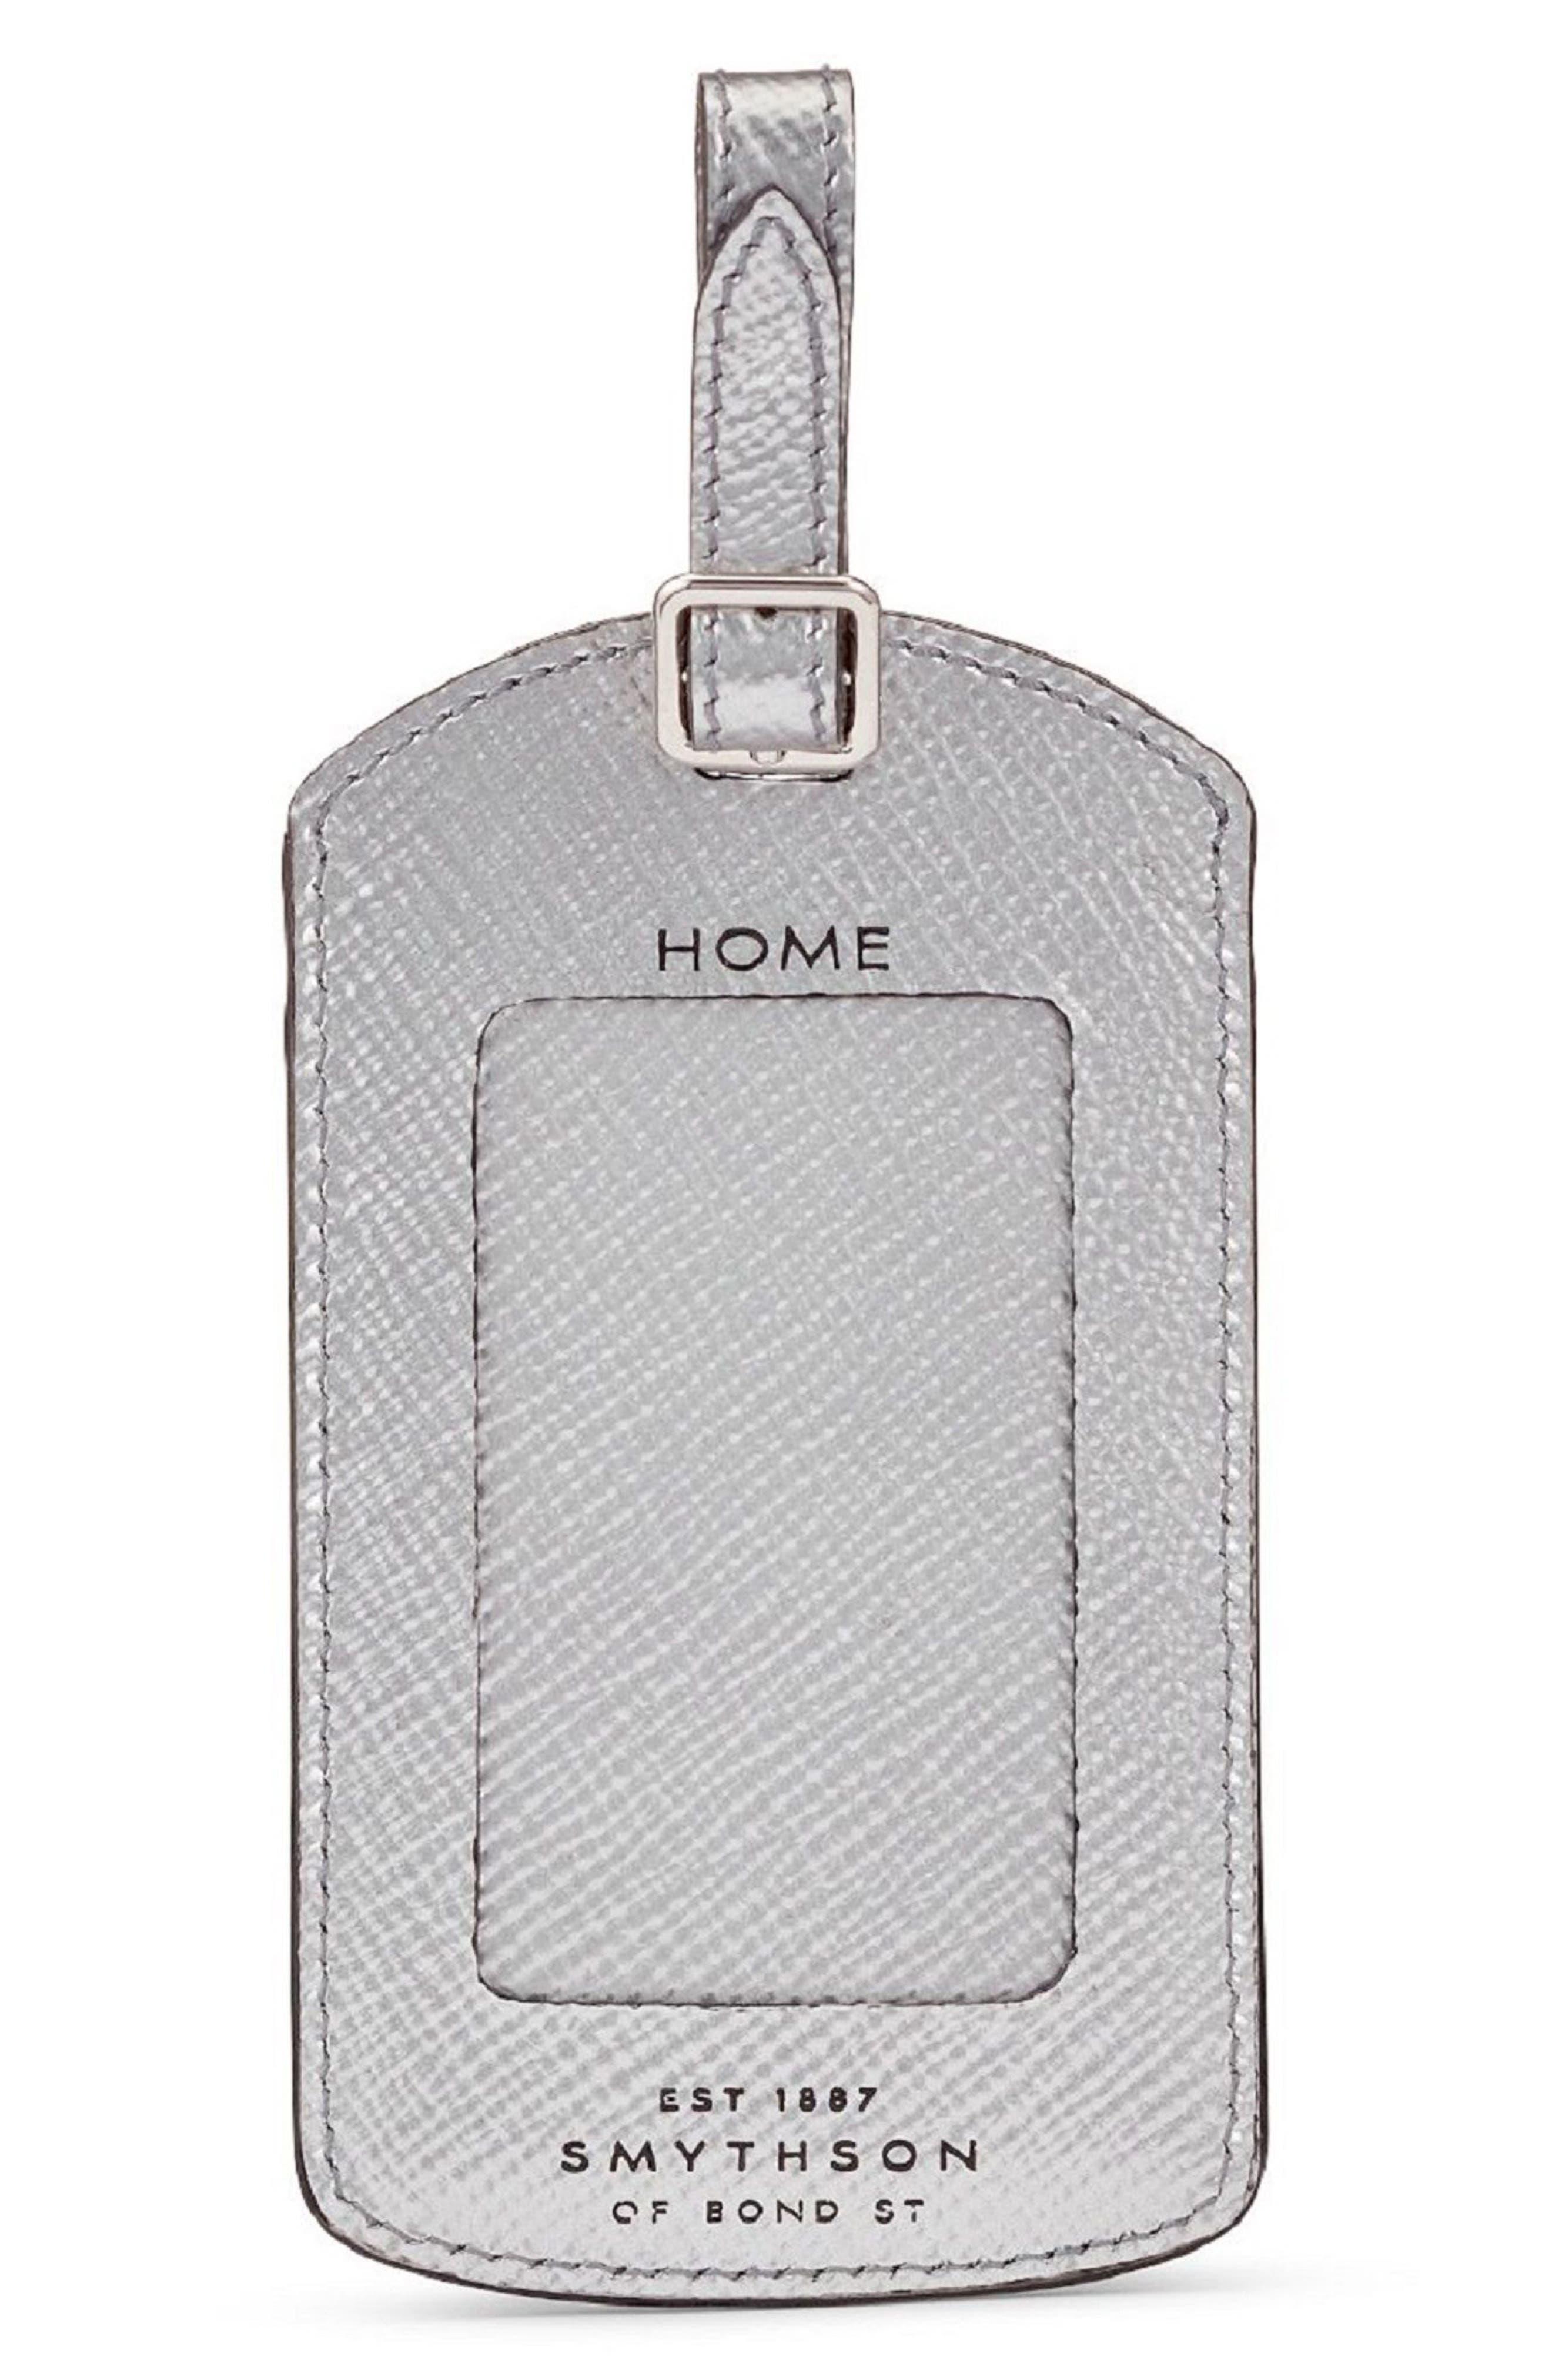 Home/Destination Calfskin Leather Luggage Tag,                             Main thumbnail 1, color,                             040